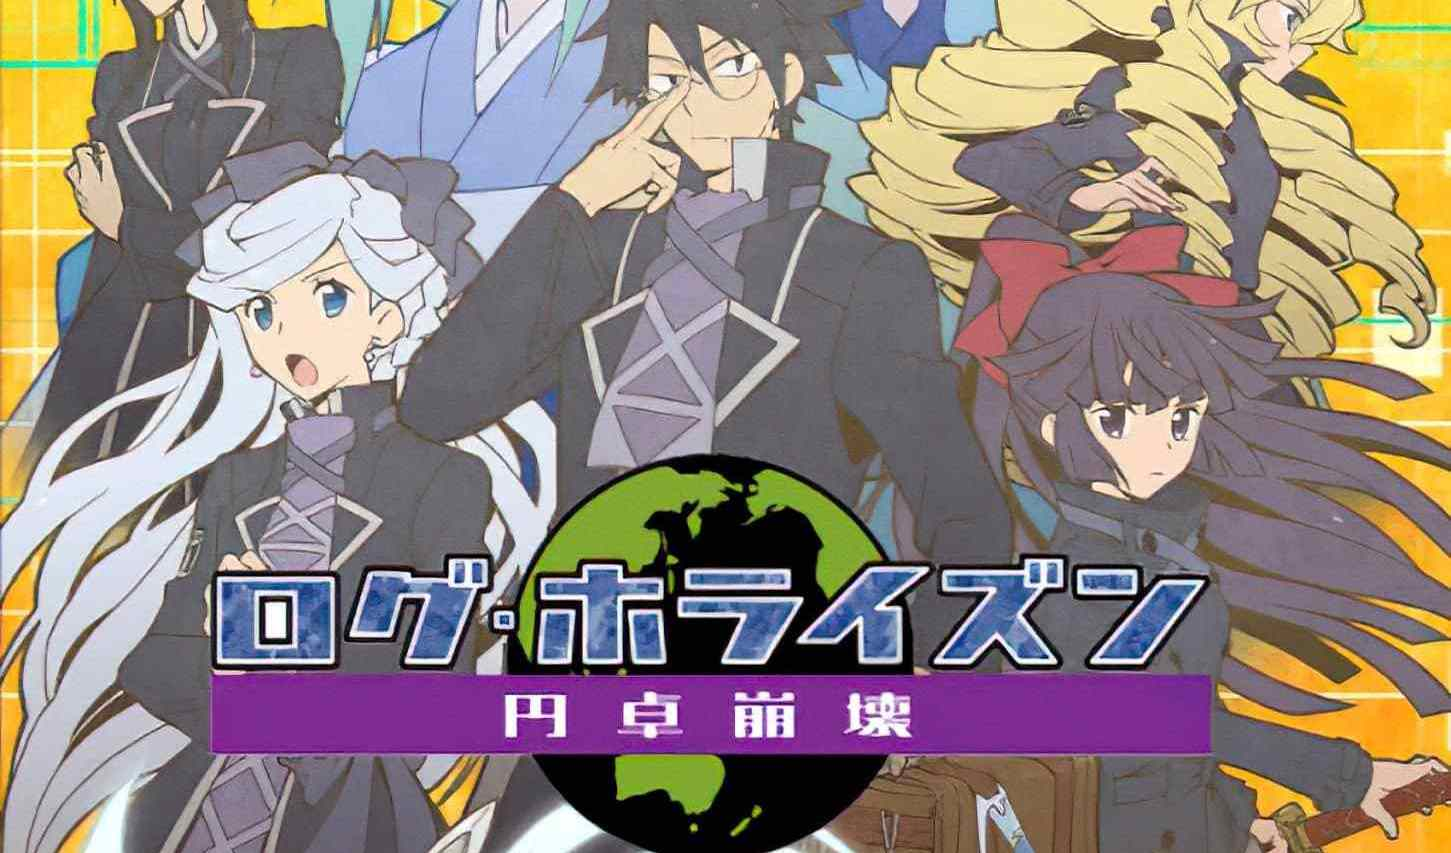 anime season 3 release 2021